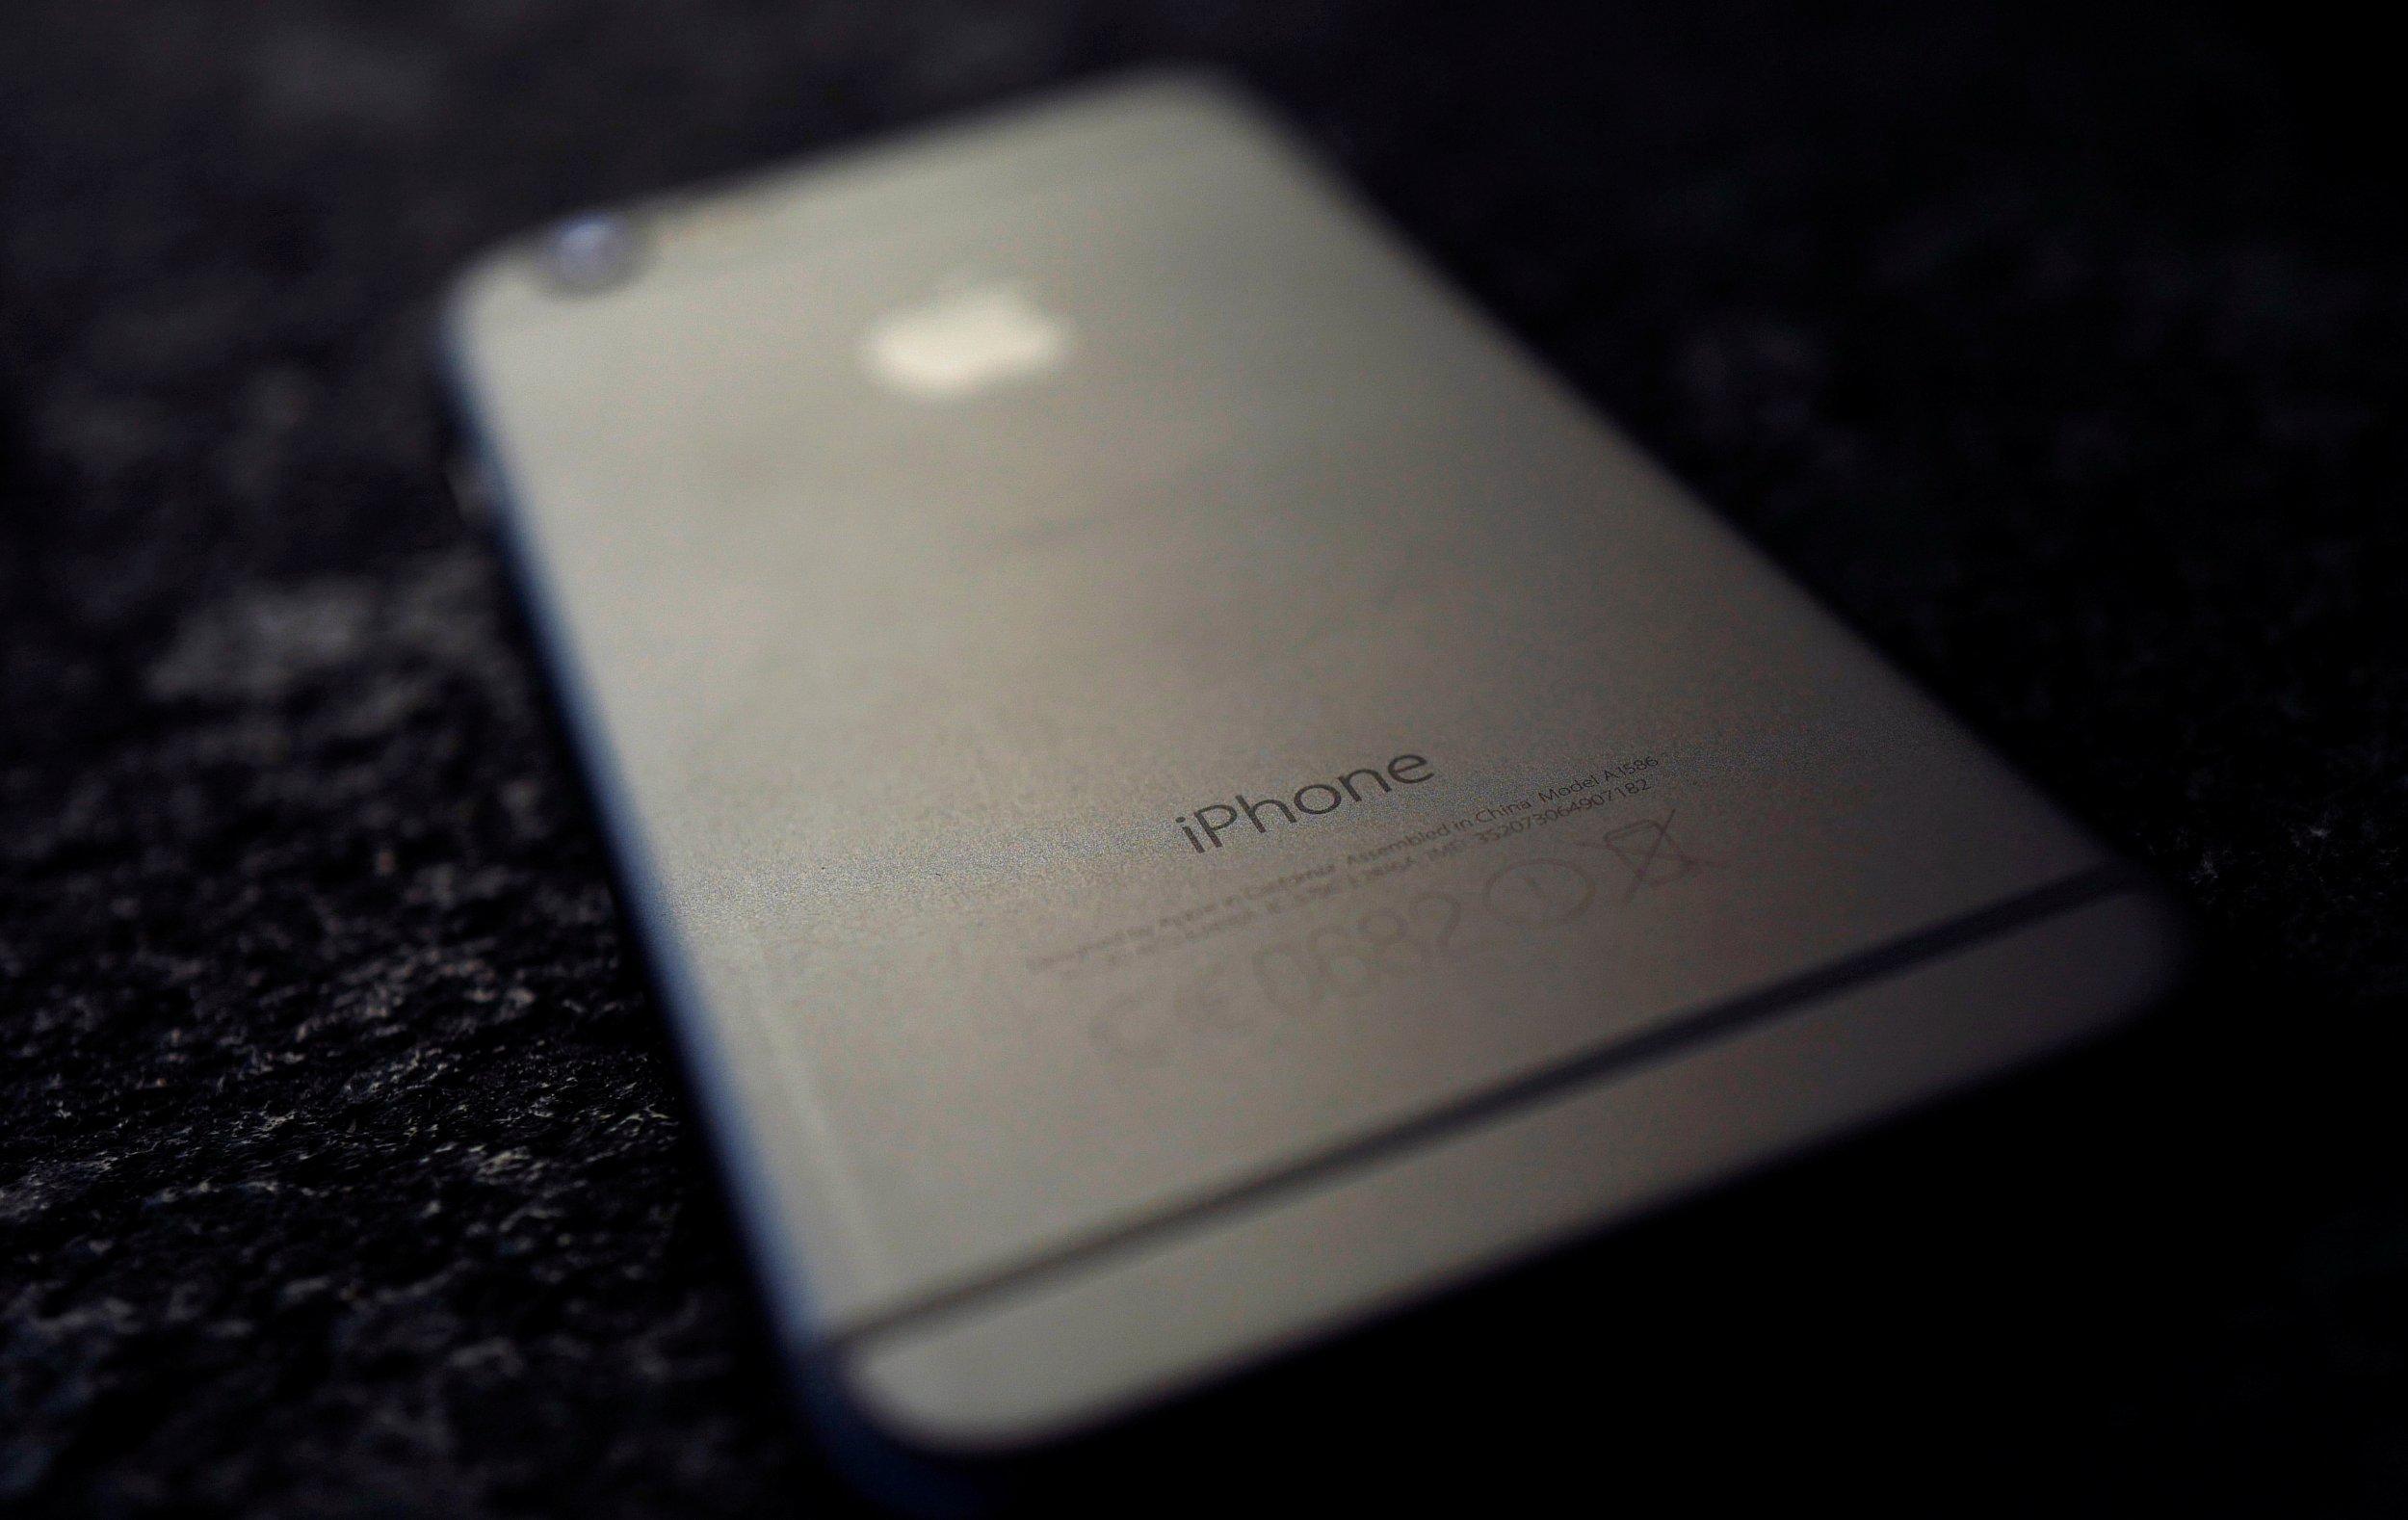 04_19_Apple_Iphone_01